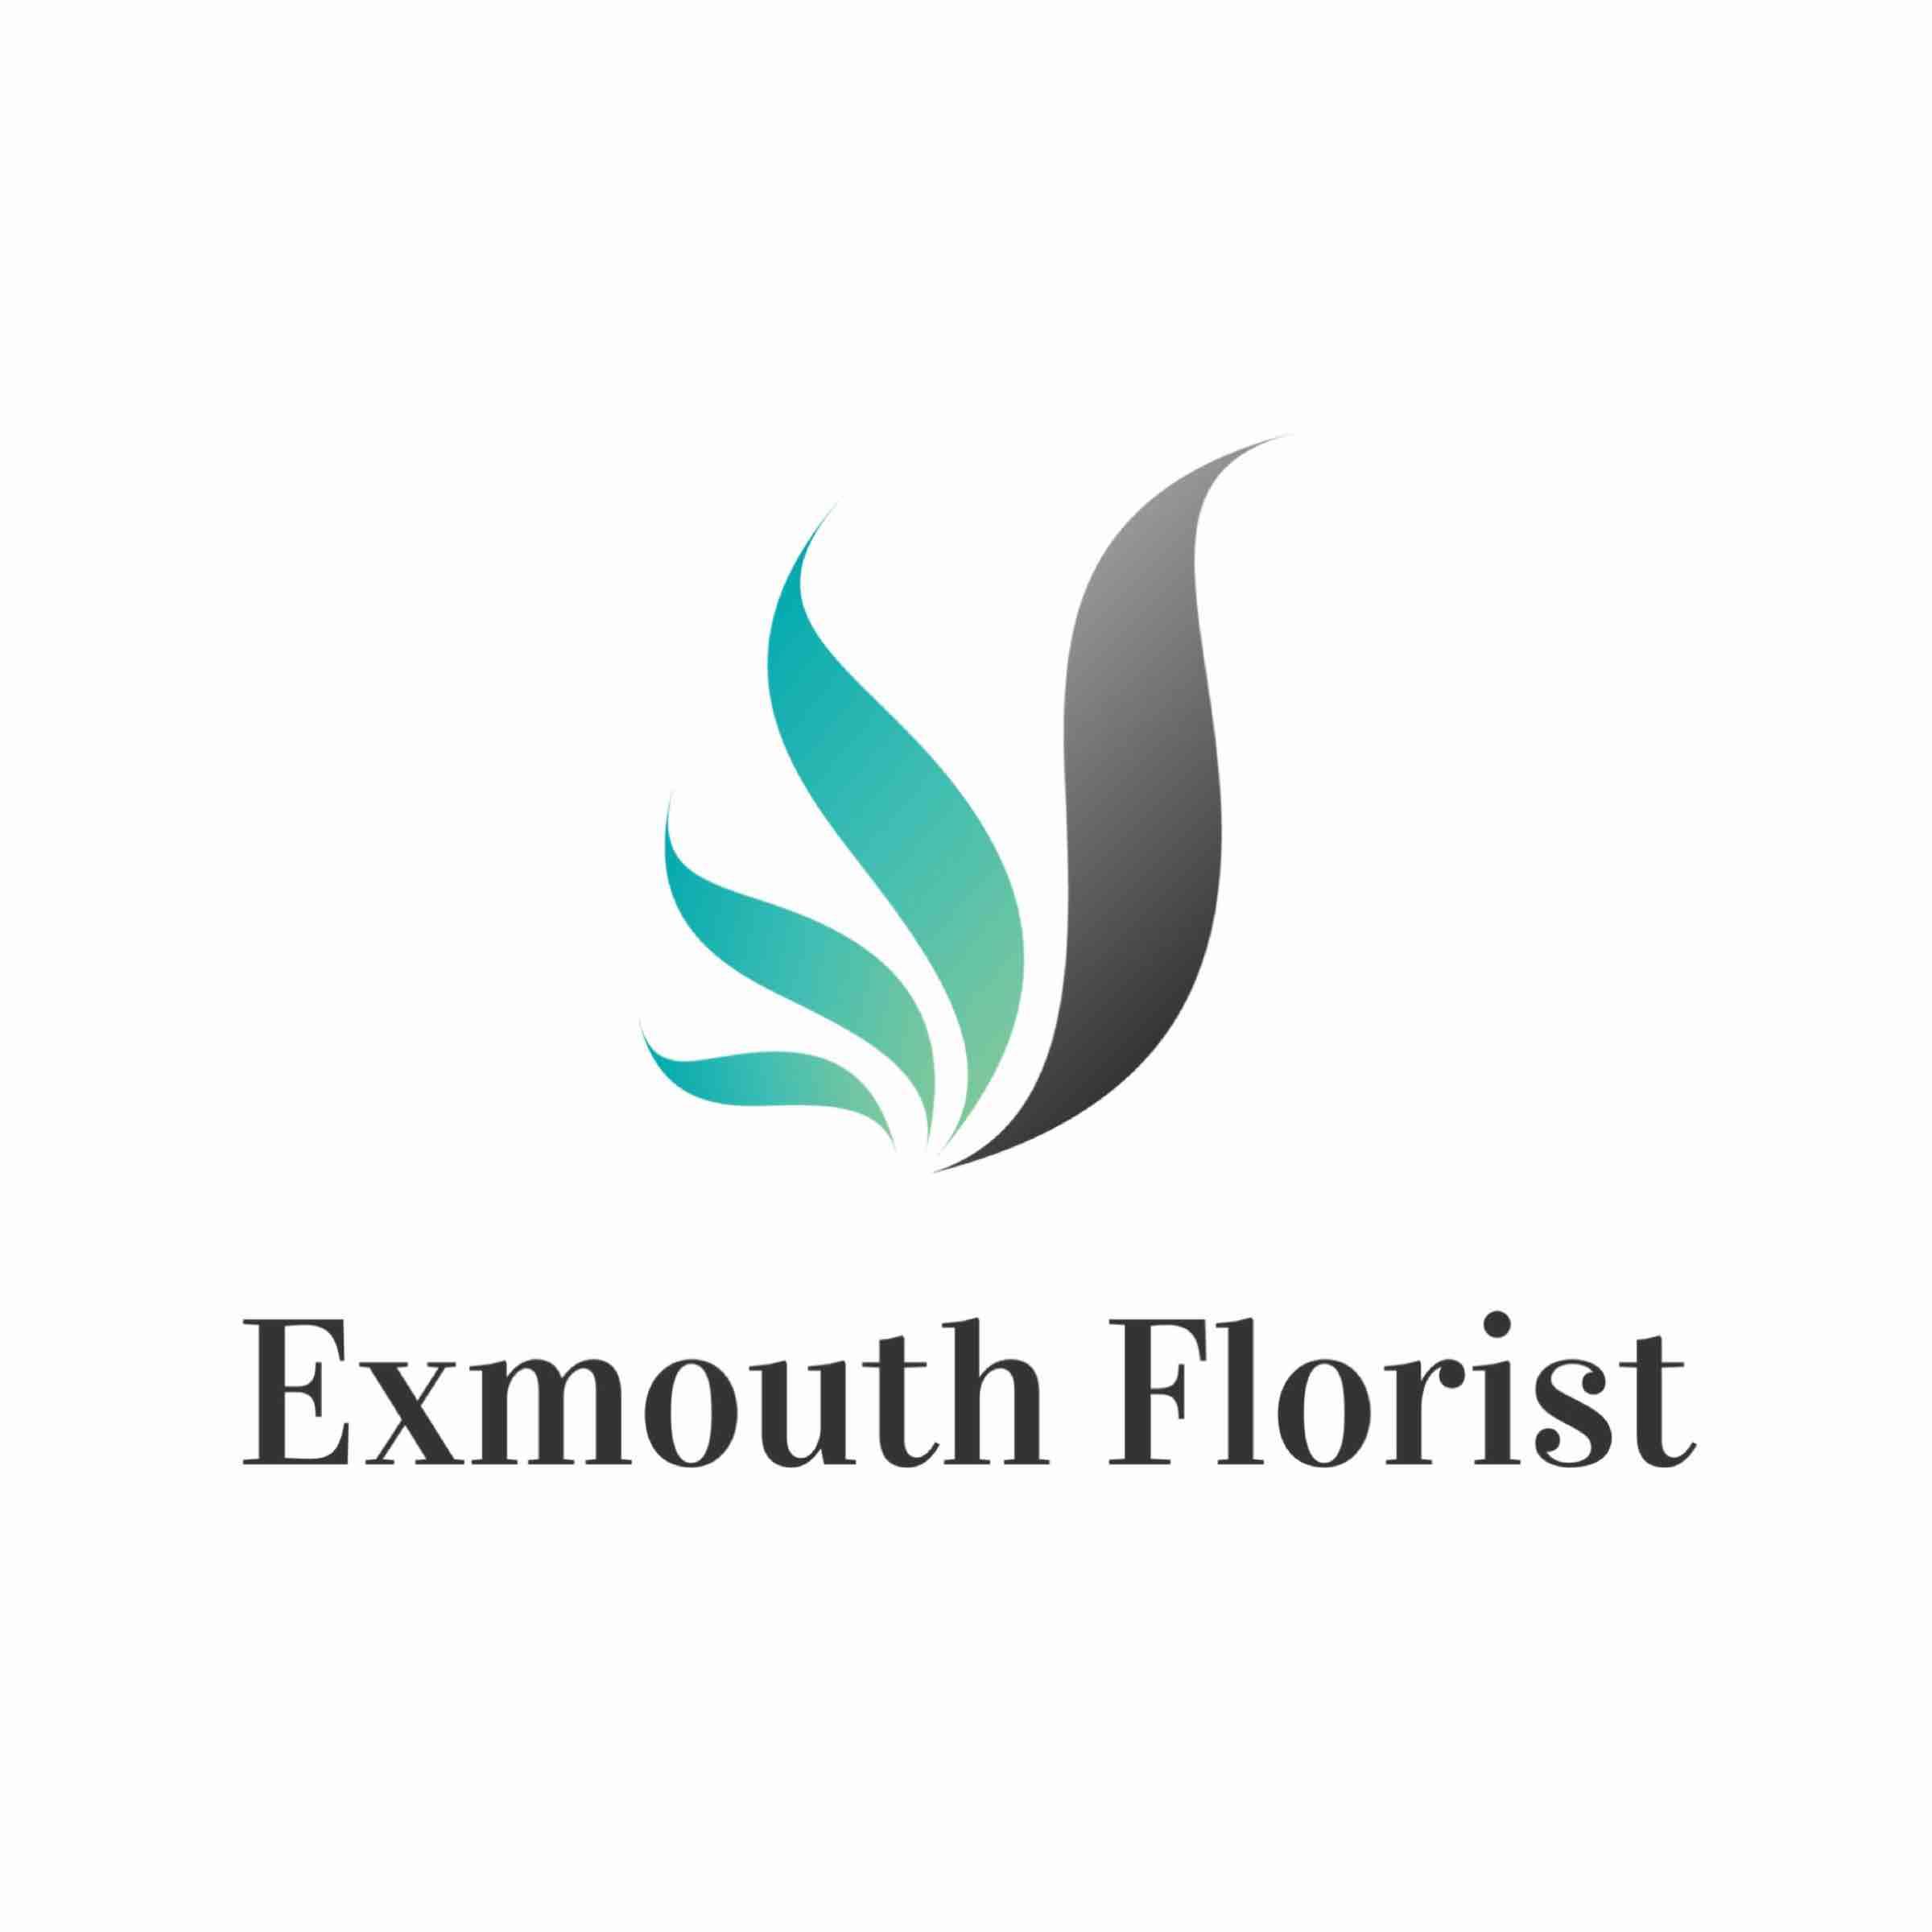 Exmouth Florist